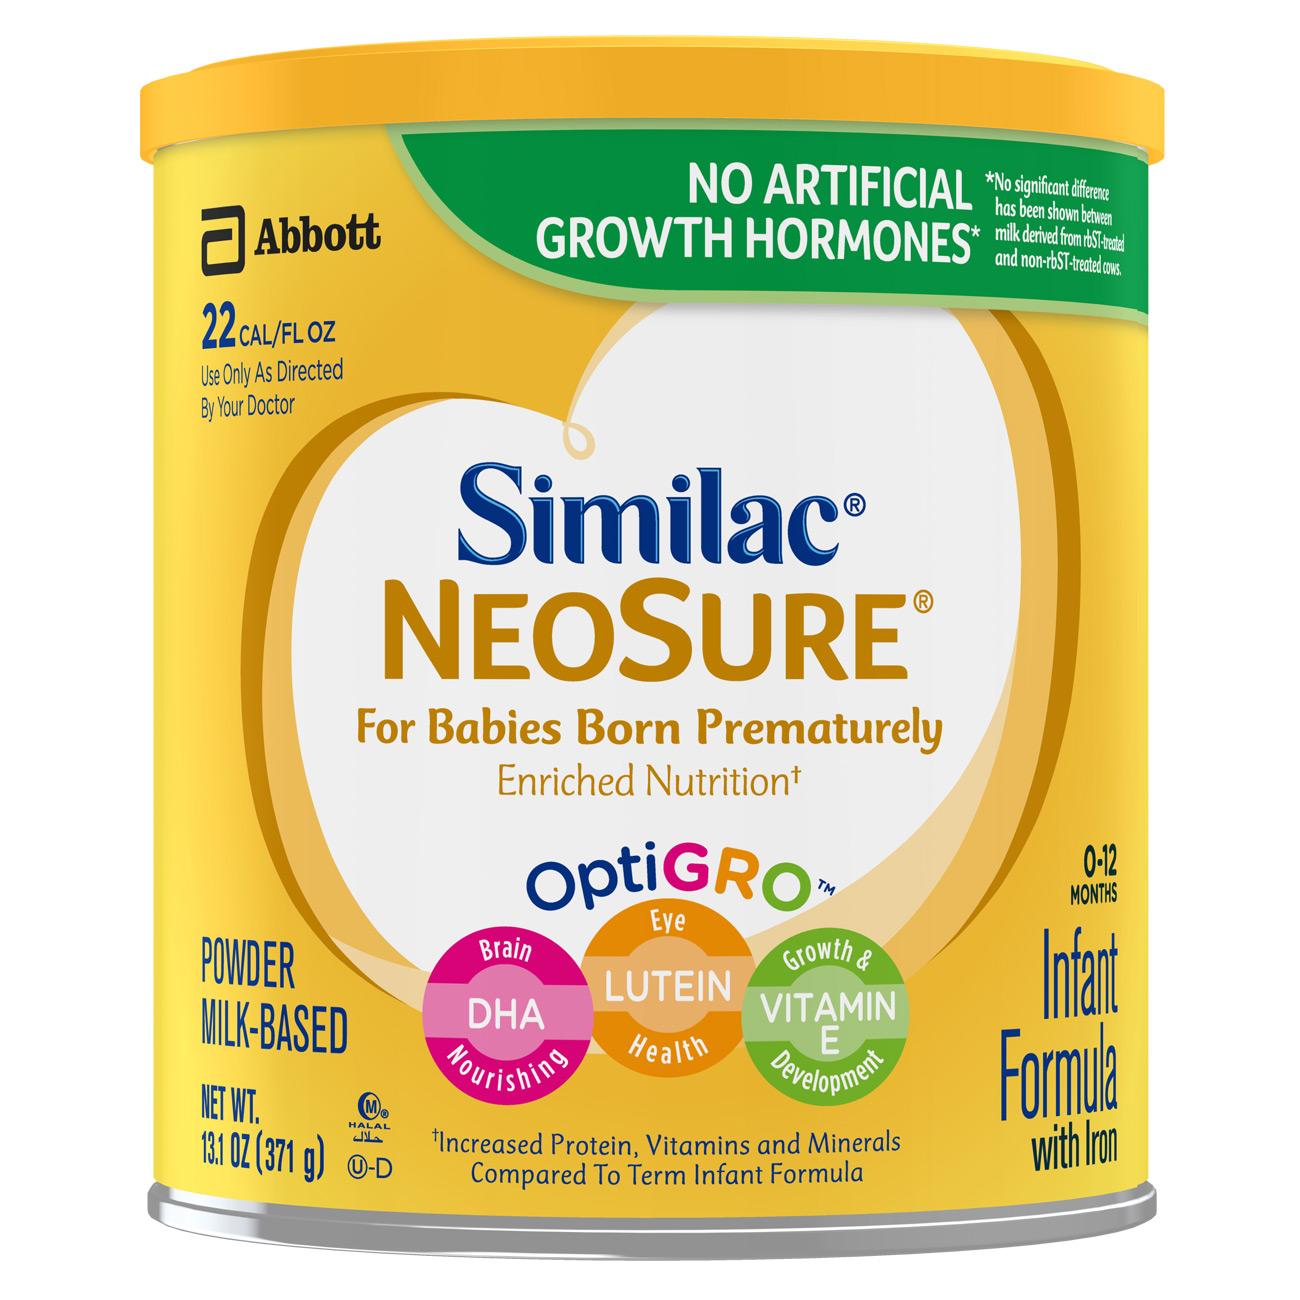 Similac NeoSure Infant Formula with Iron, For Babies Born Prematurely, Powder, 13.1 oz